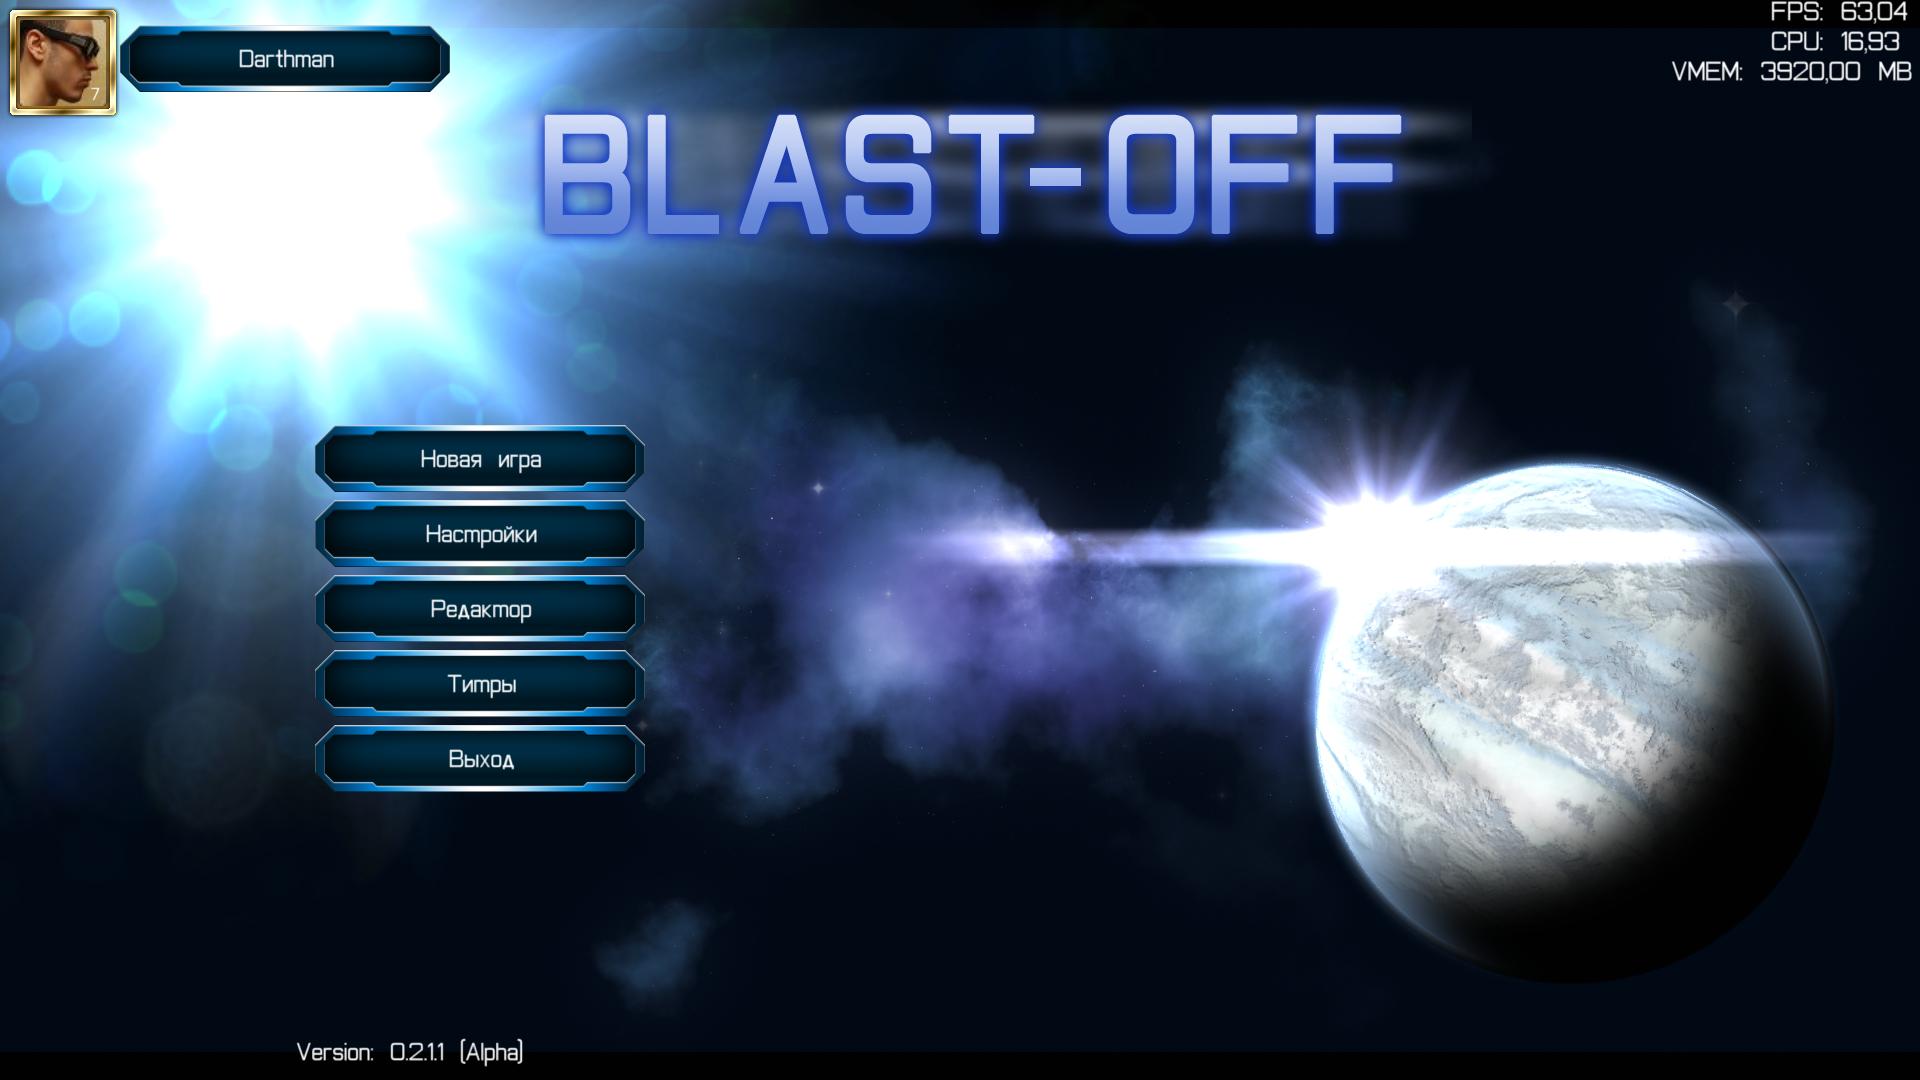 Blast-off - Изображение 1